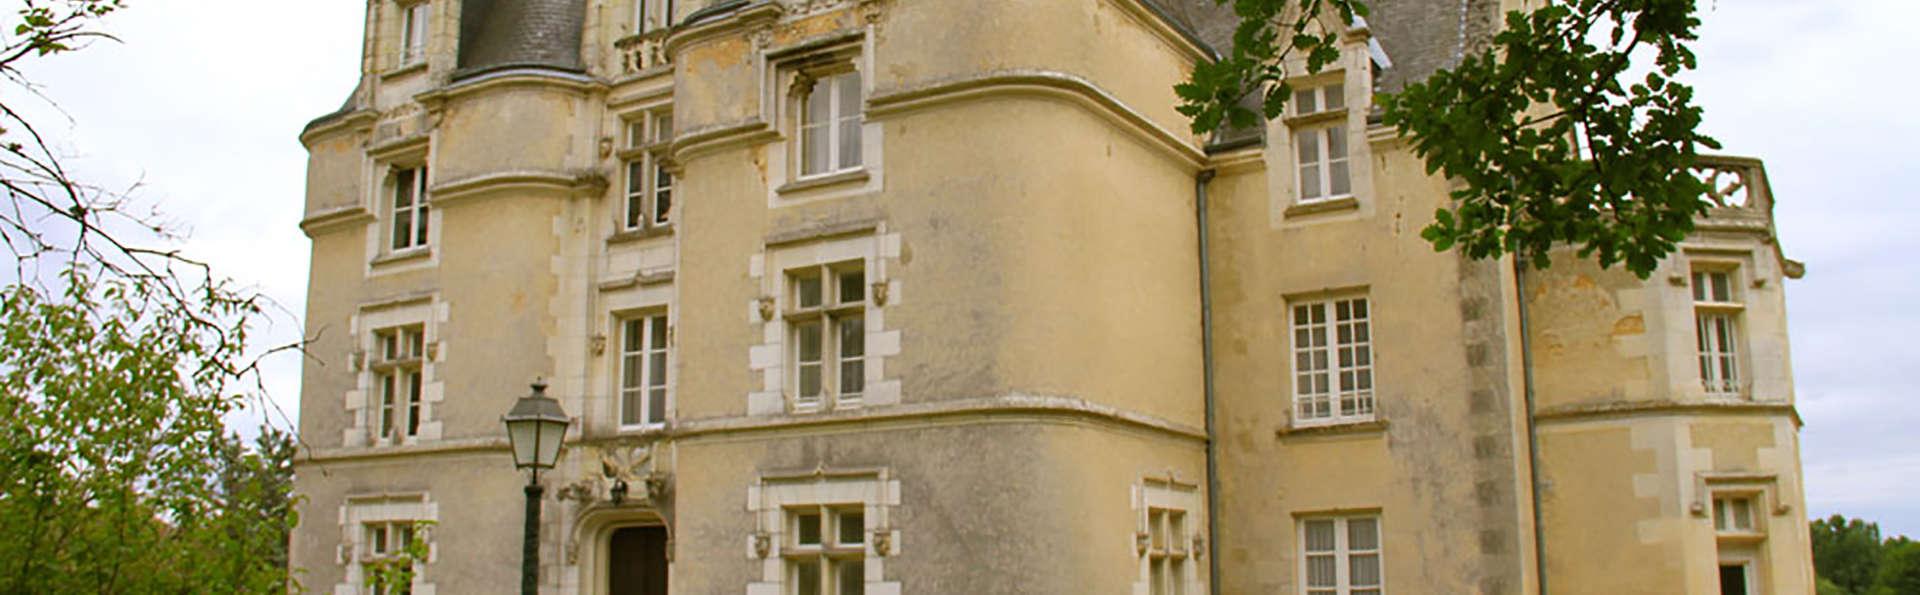 Château de Périgny  - EDIT_chateau1.jpg